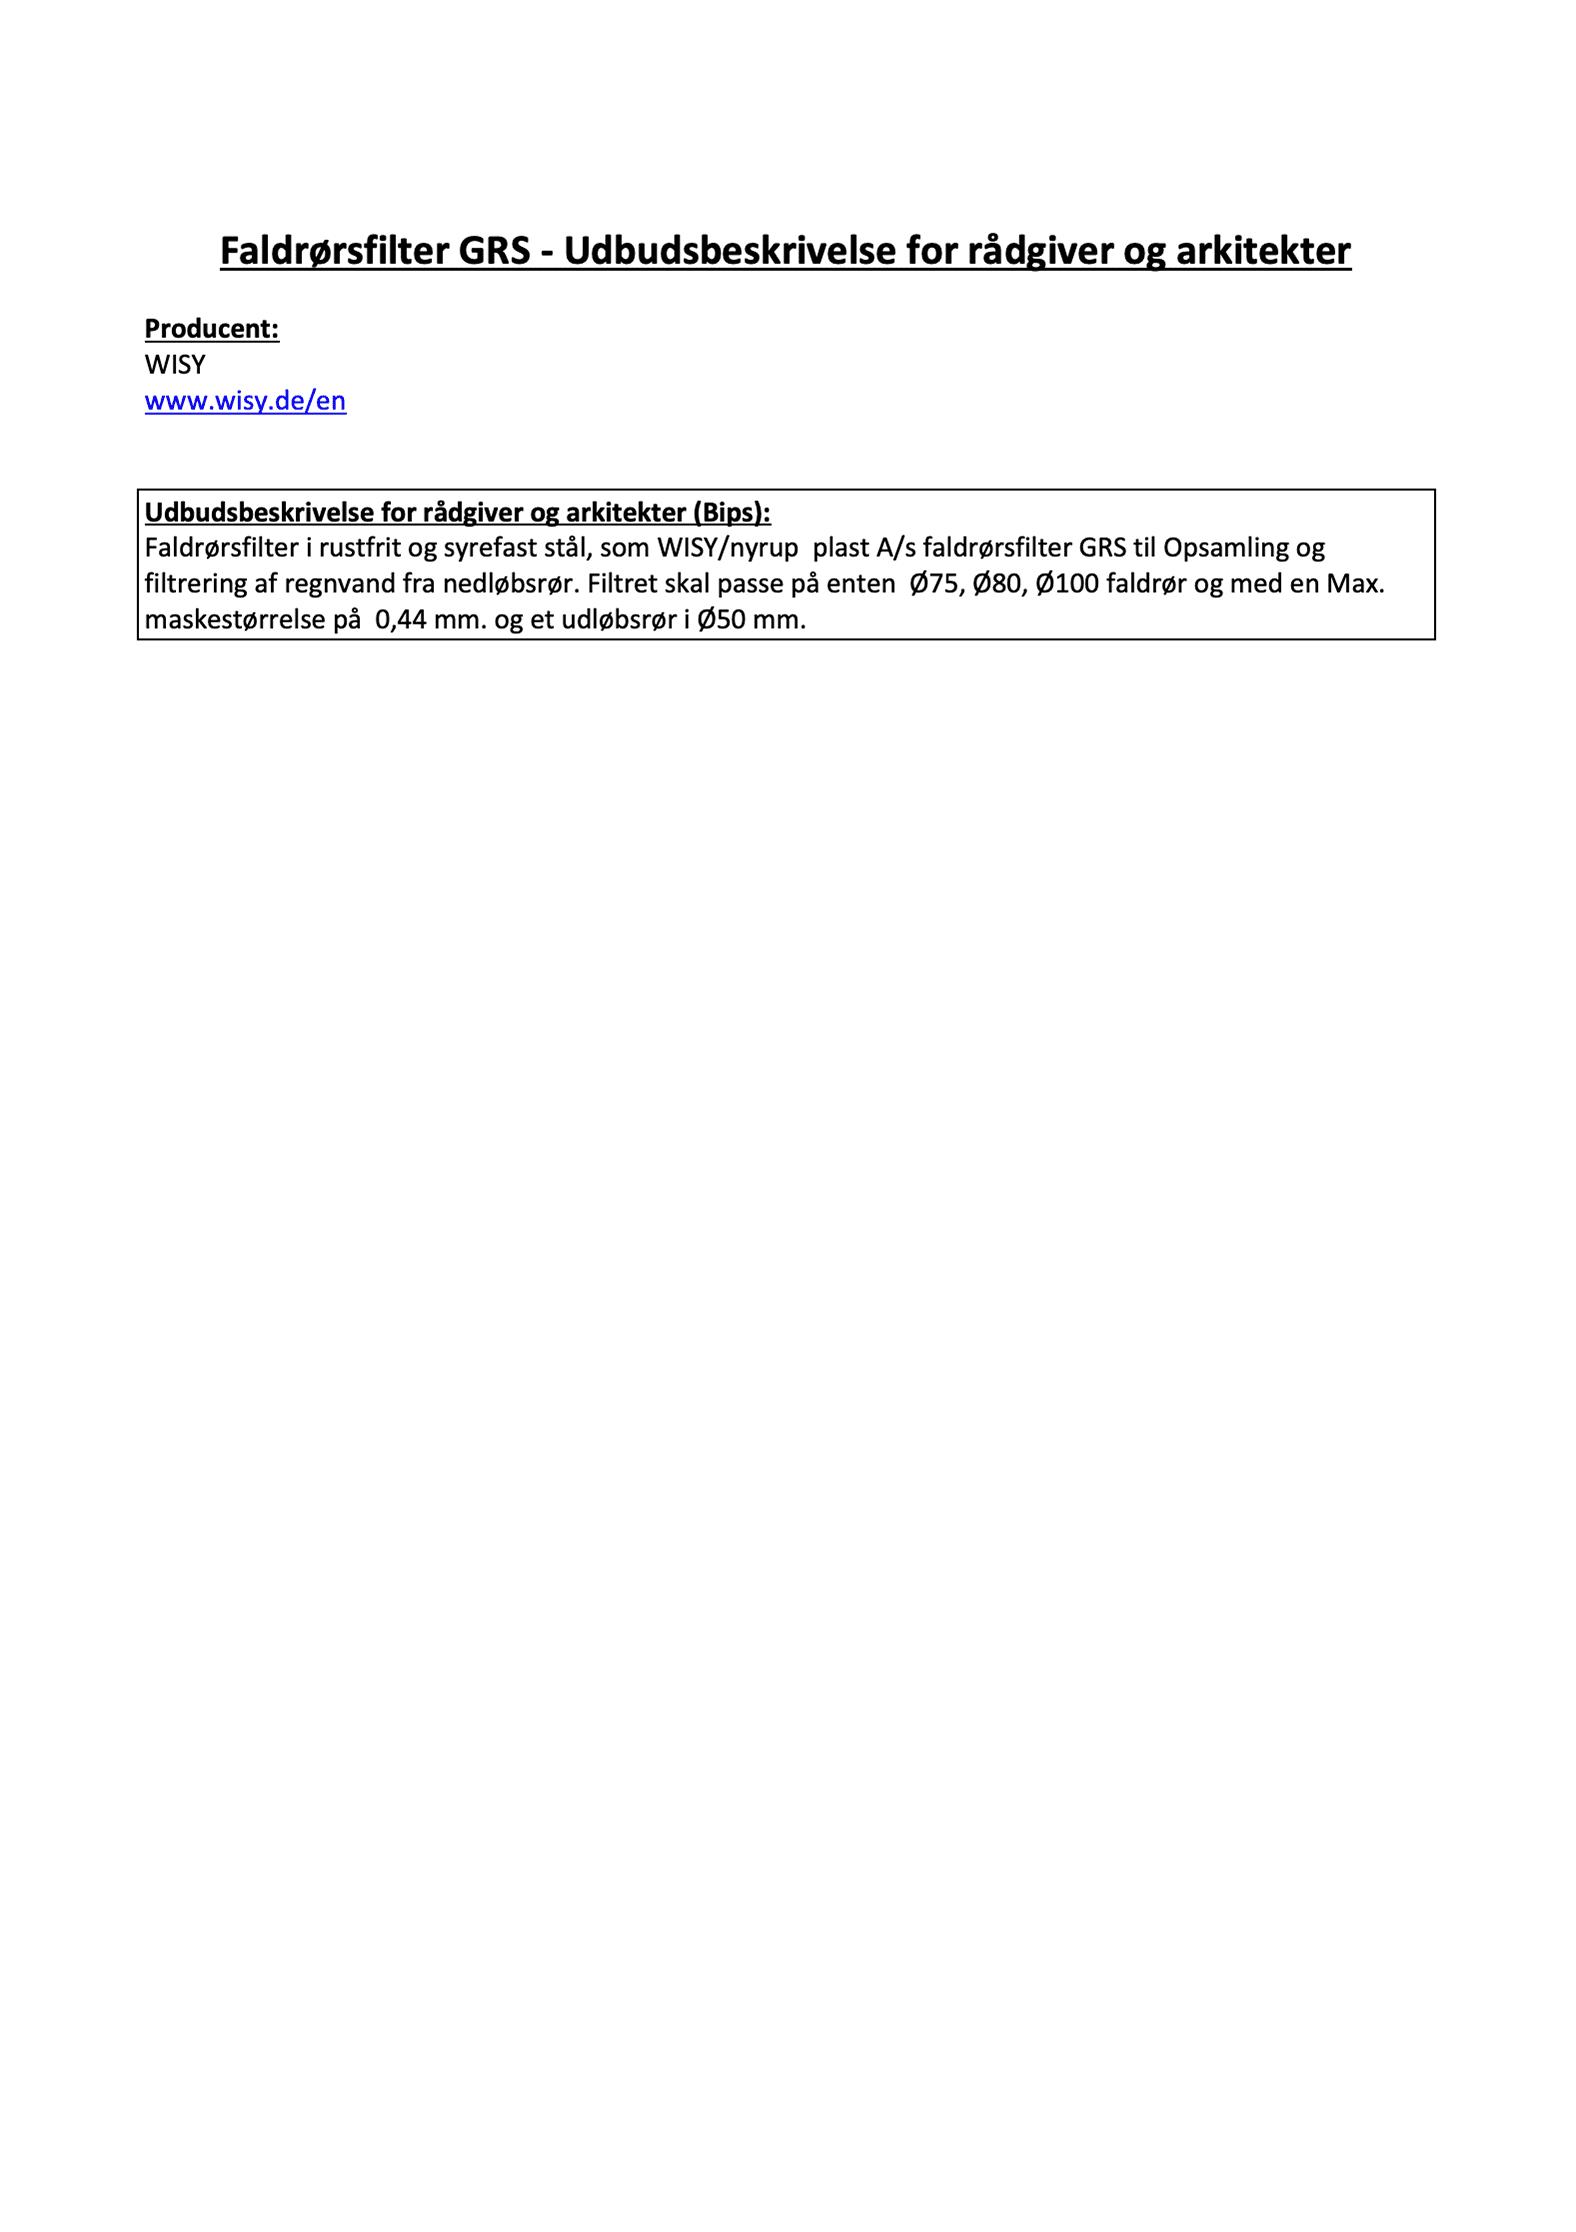 Udbudsbeskrivelse faldrorsfilter GRS